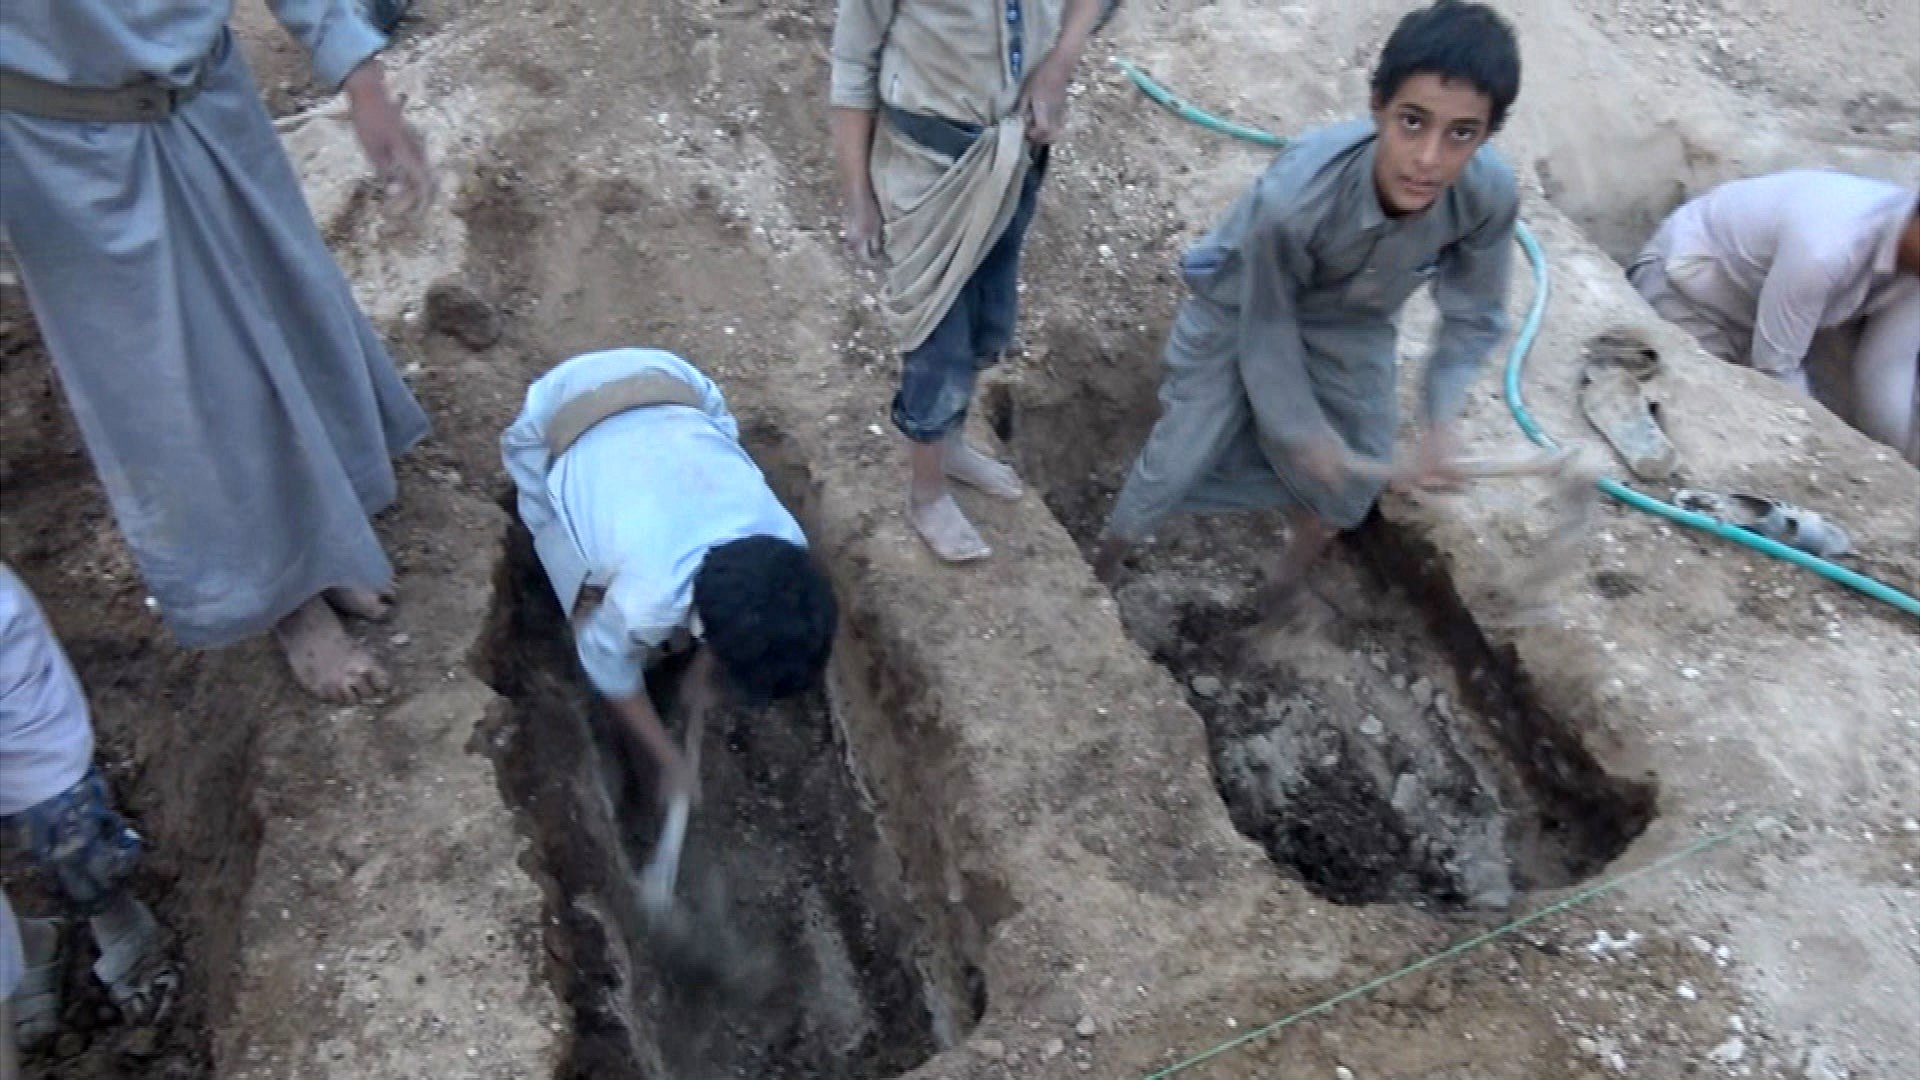 Yemen war: Boys dig friends' graves after air strike